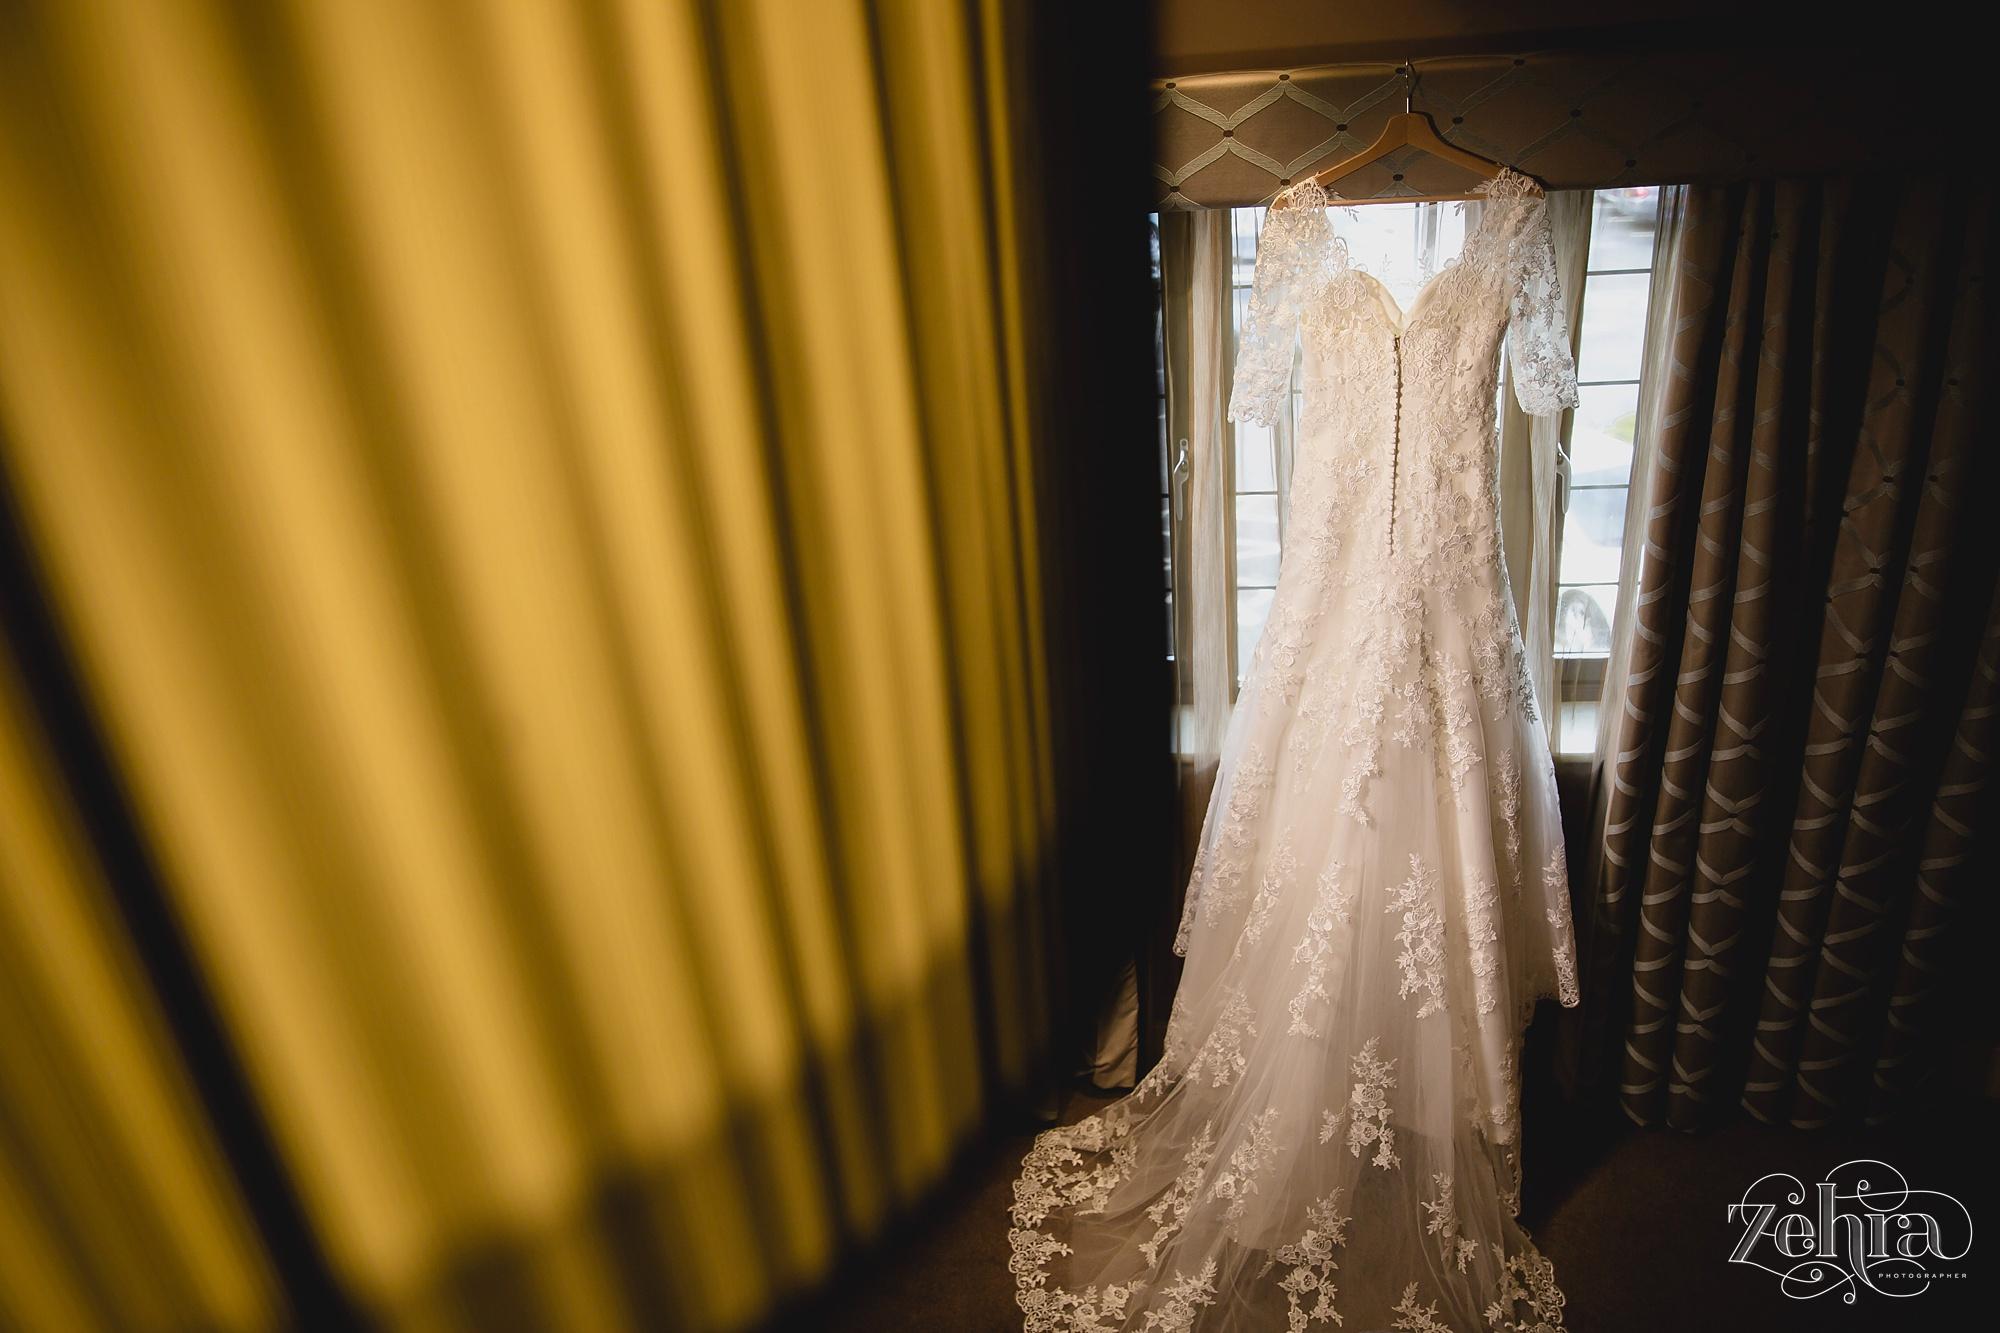 zehra photographer mere cheshire wedding_0001.jpg